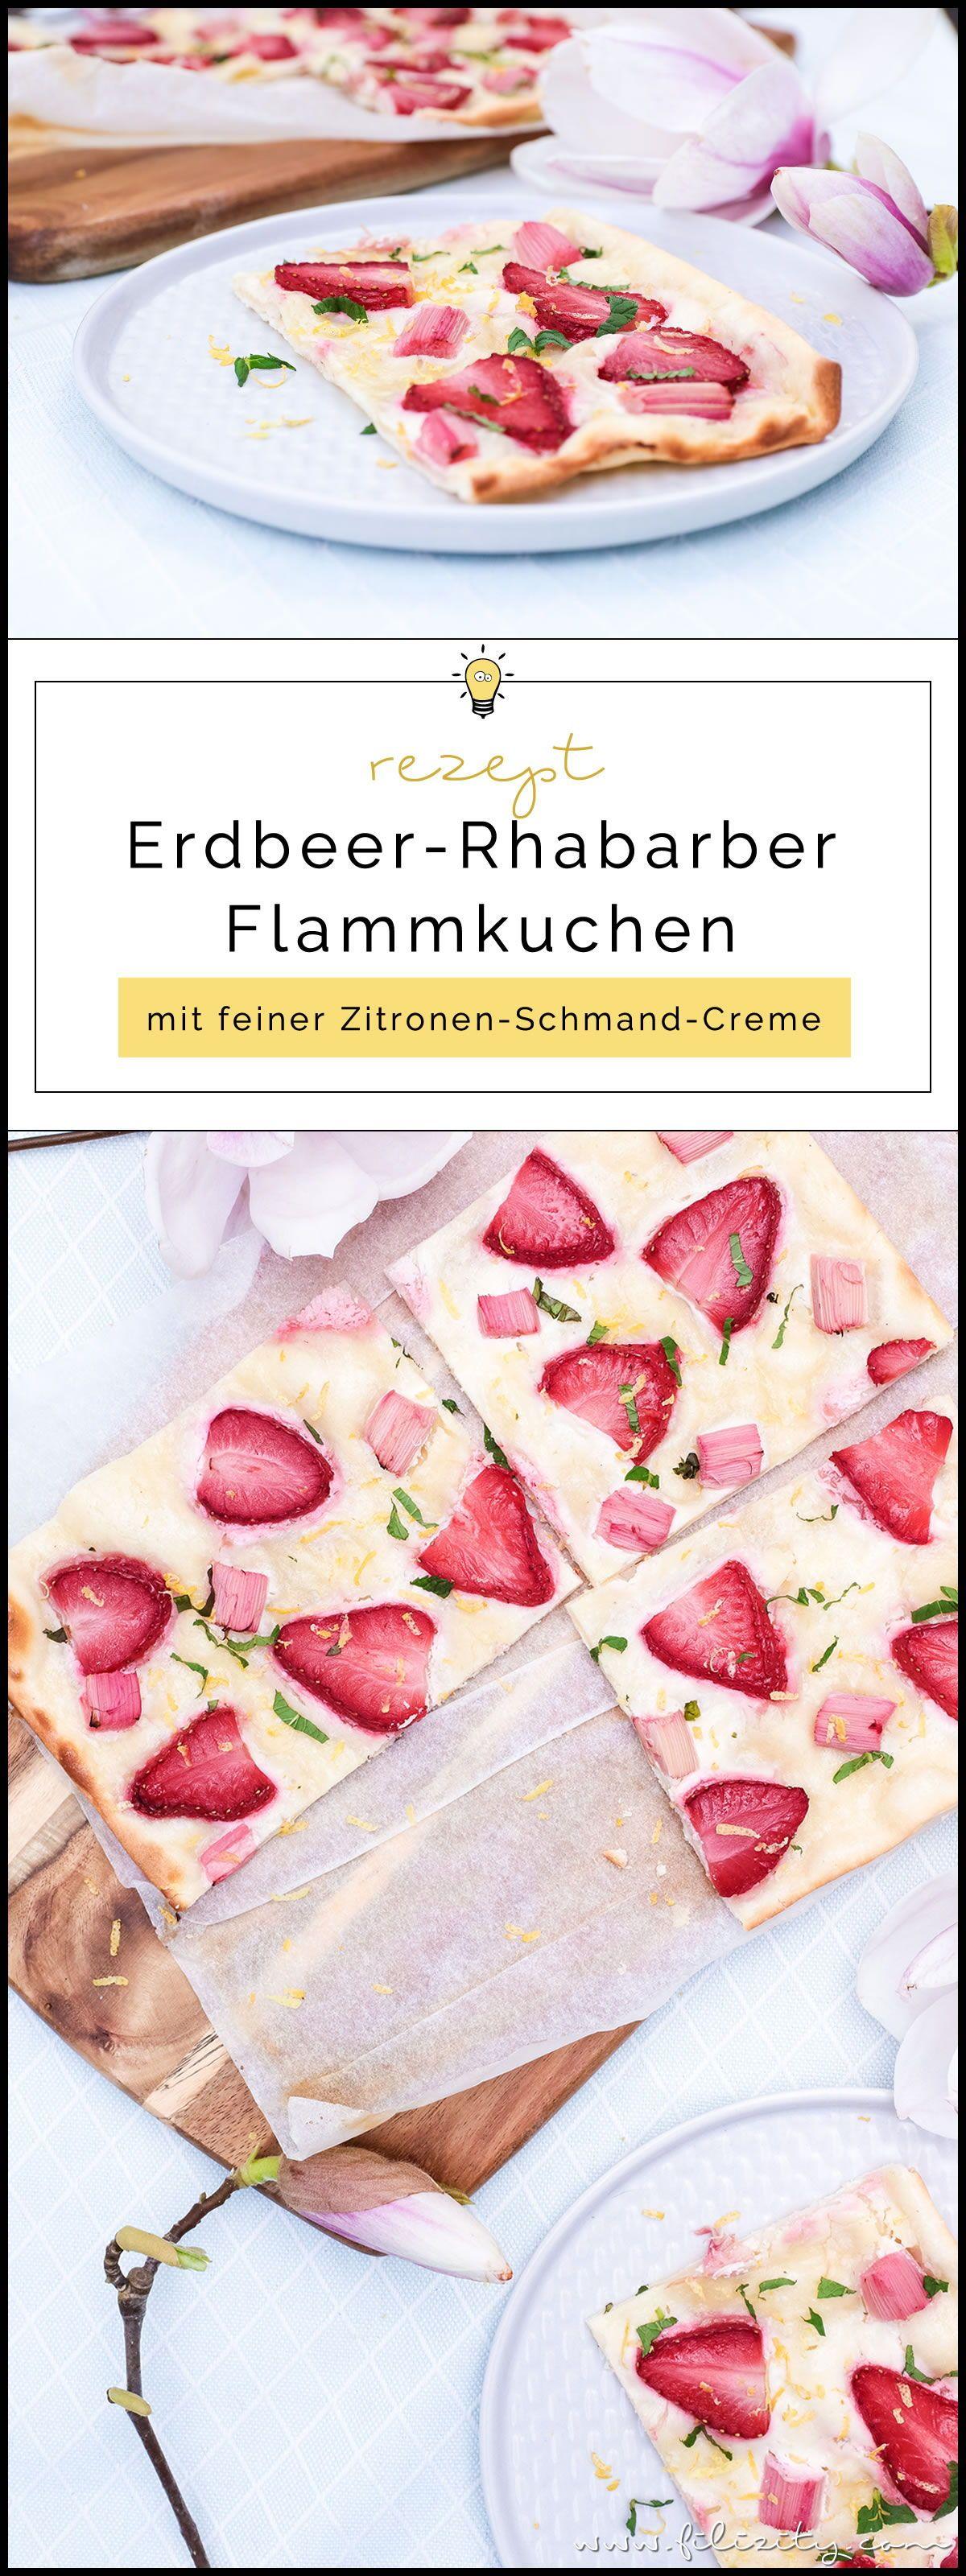 Frühlings-Rezept: Erdbeer-Rhabarber-Flammkuchen | Filizity.com | Food-Blog aus dem Rheinland #foodblogs